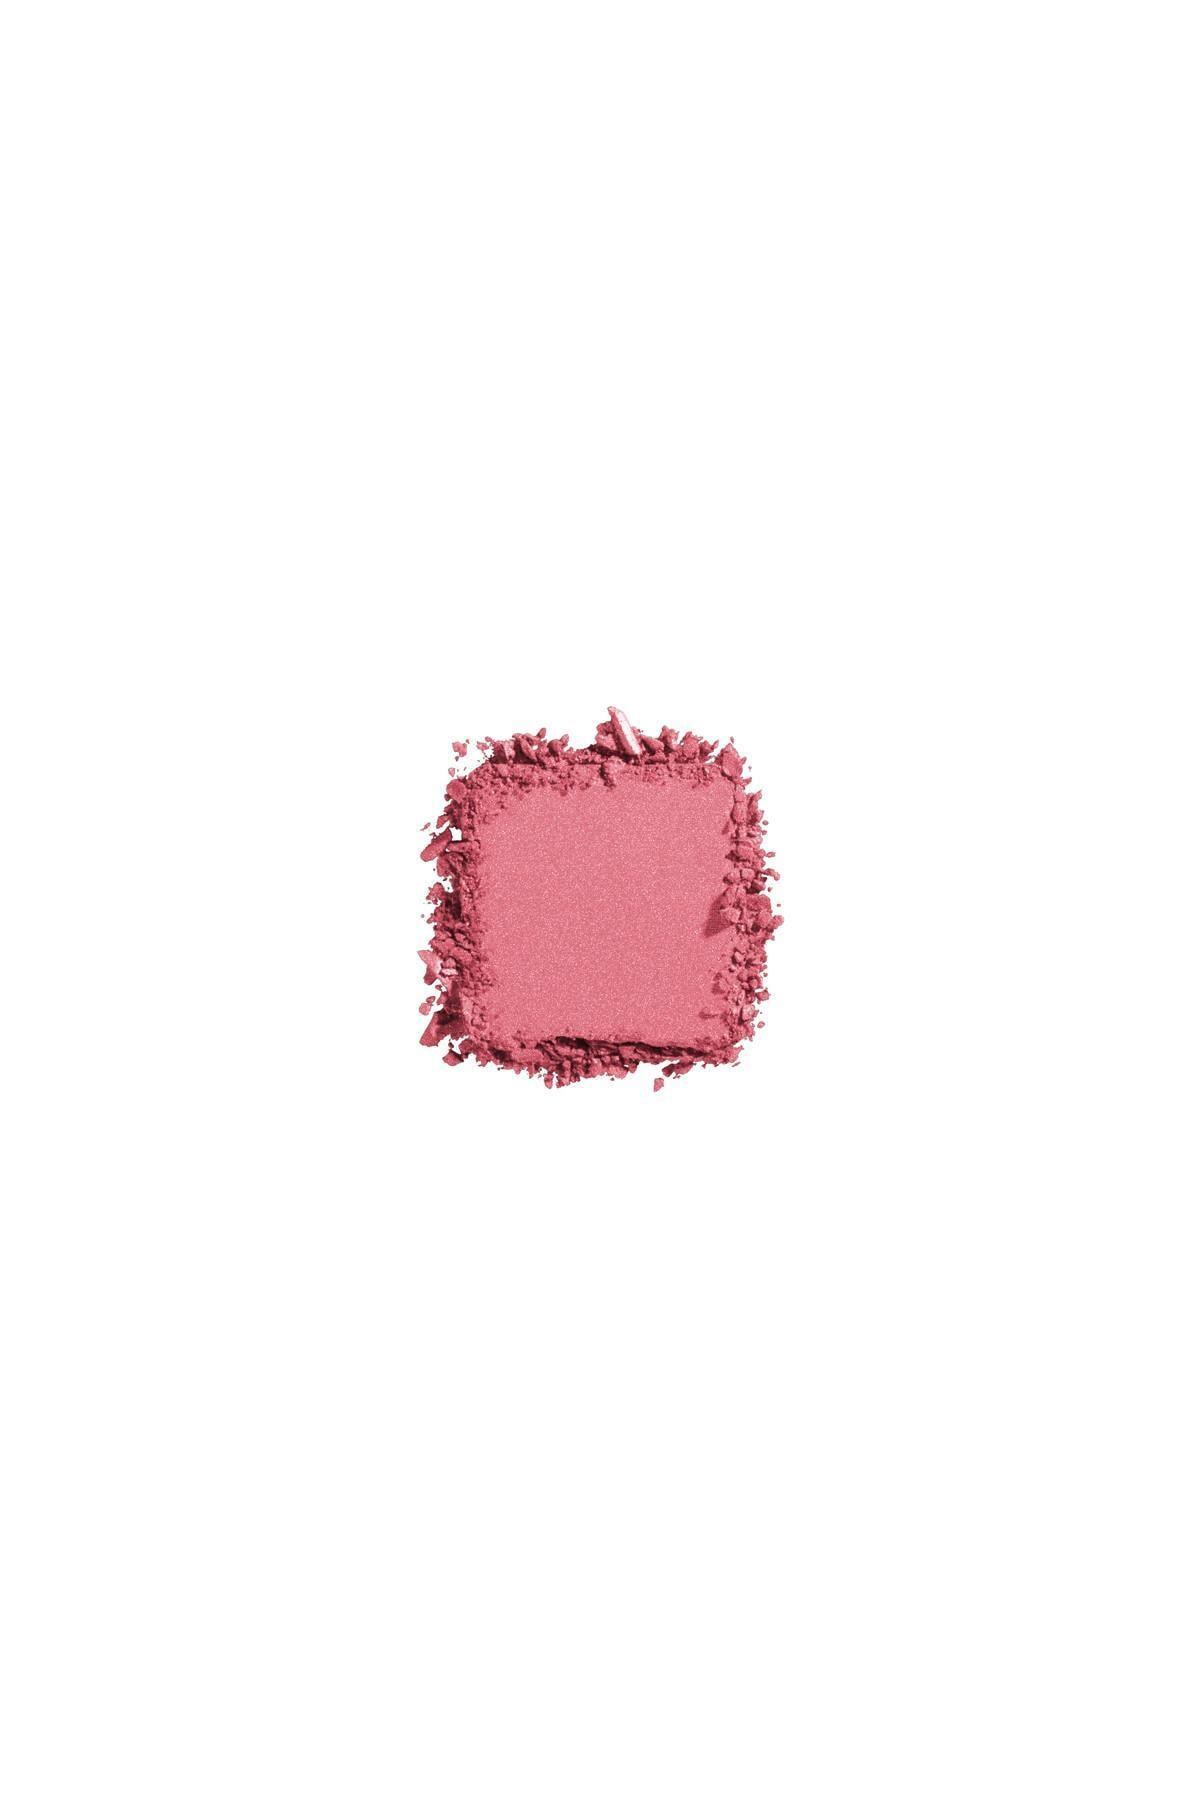 NYX Professional Makeup Işıltı Veren Allık - Sweet Cheeks Creamy Powder Blush Glow - Day Dream 800897192396 2